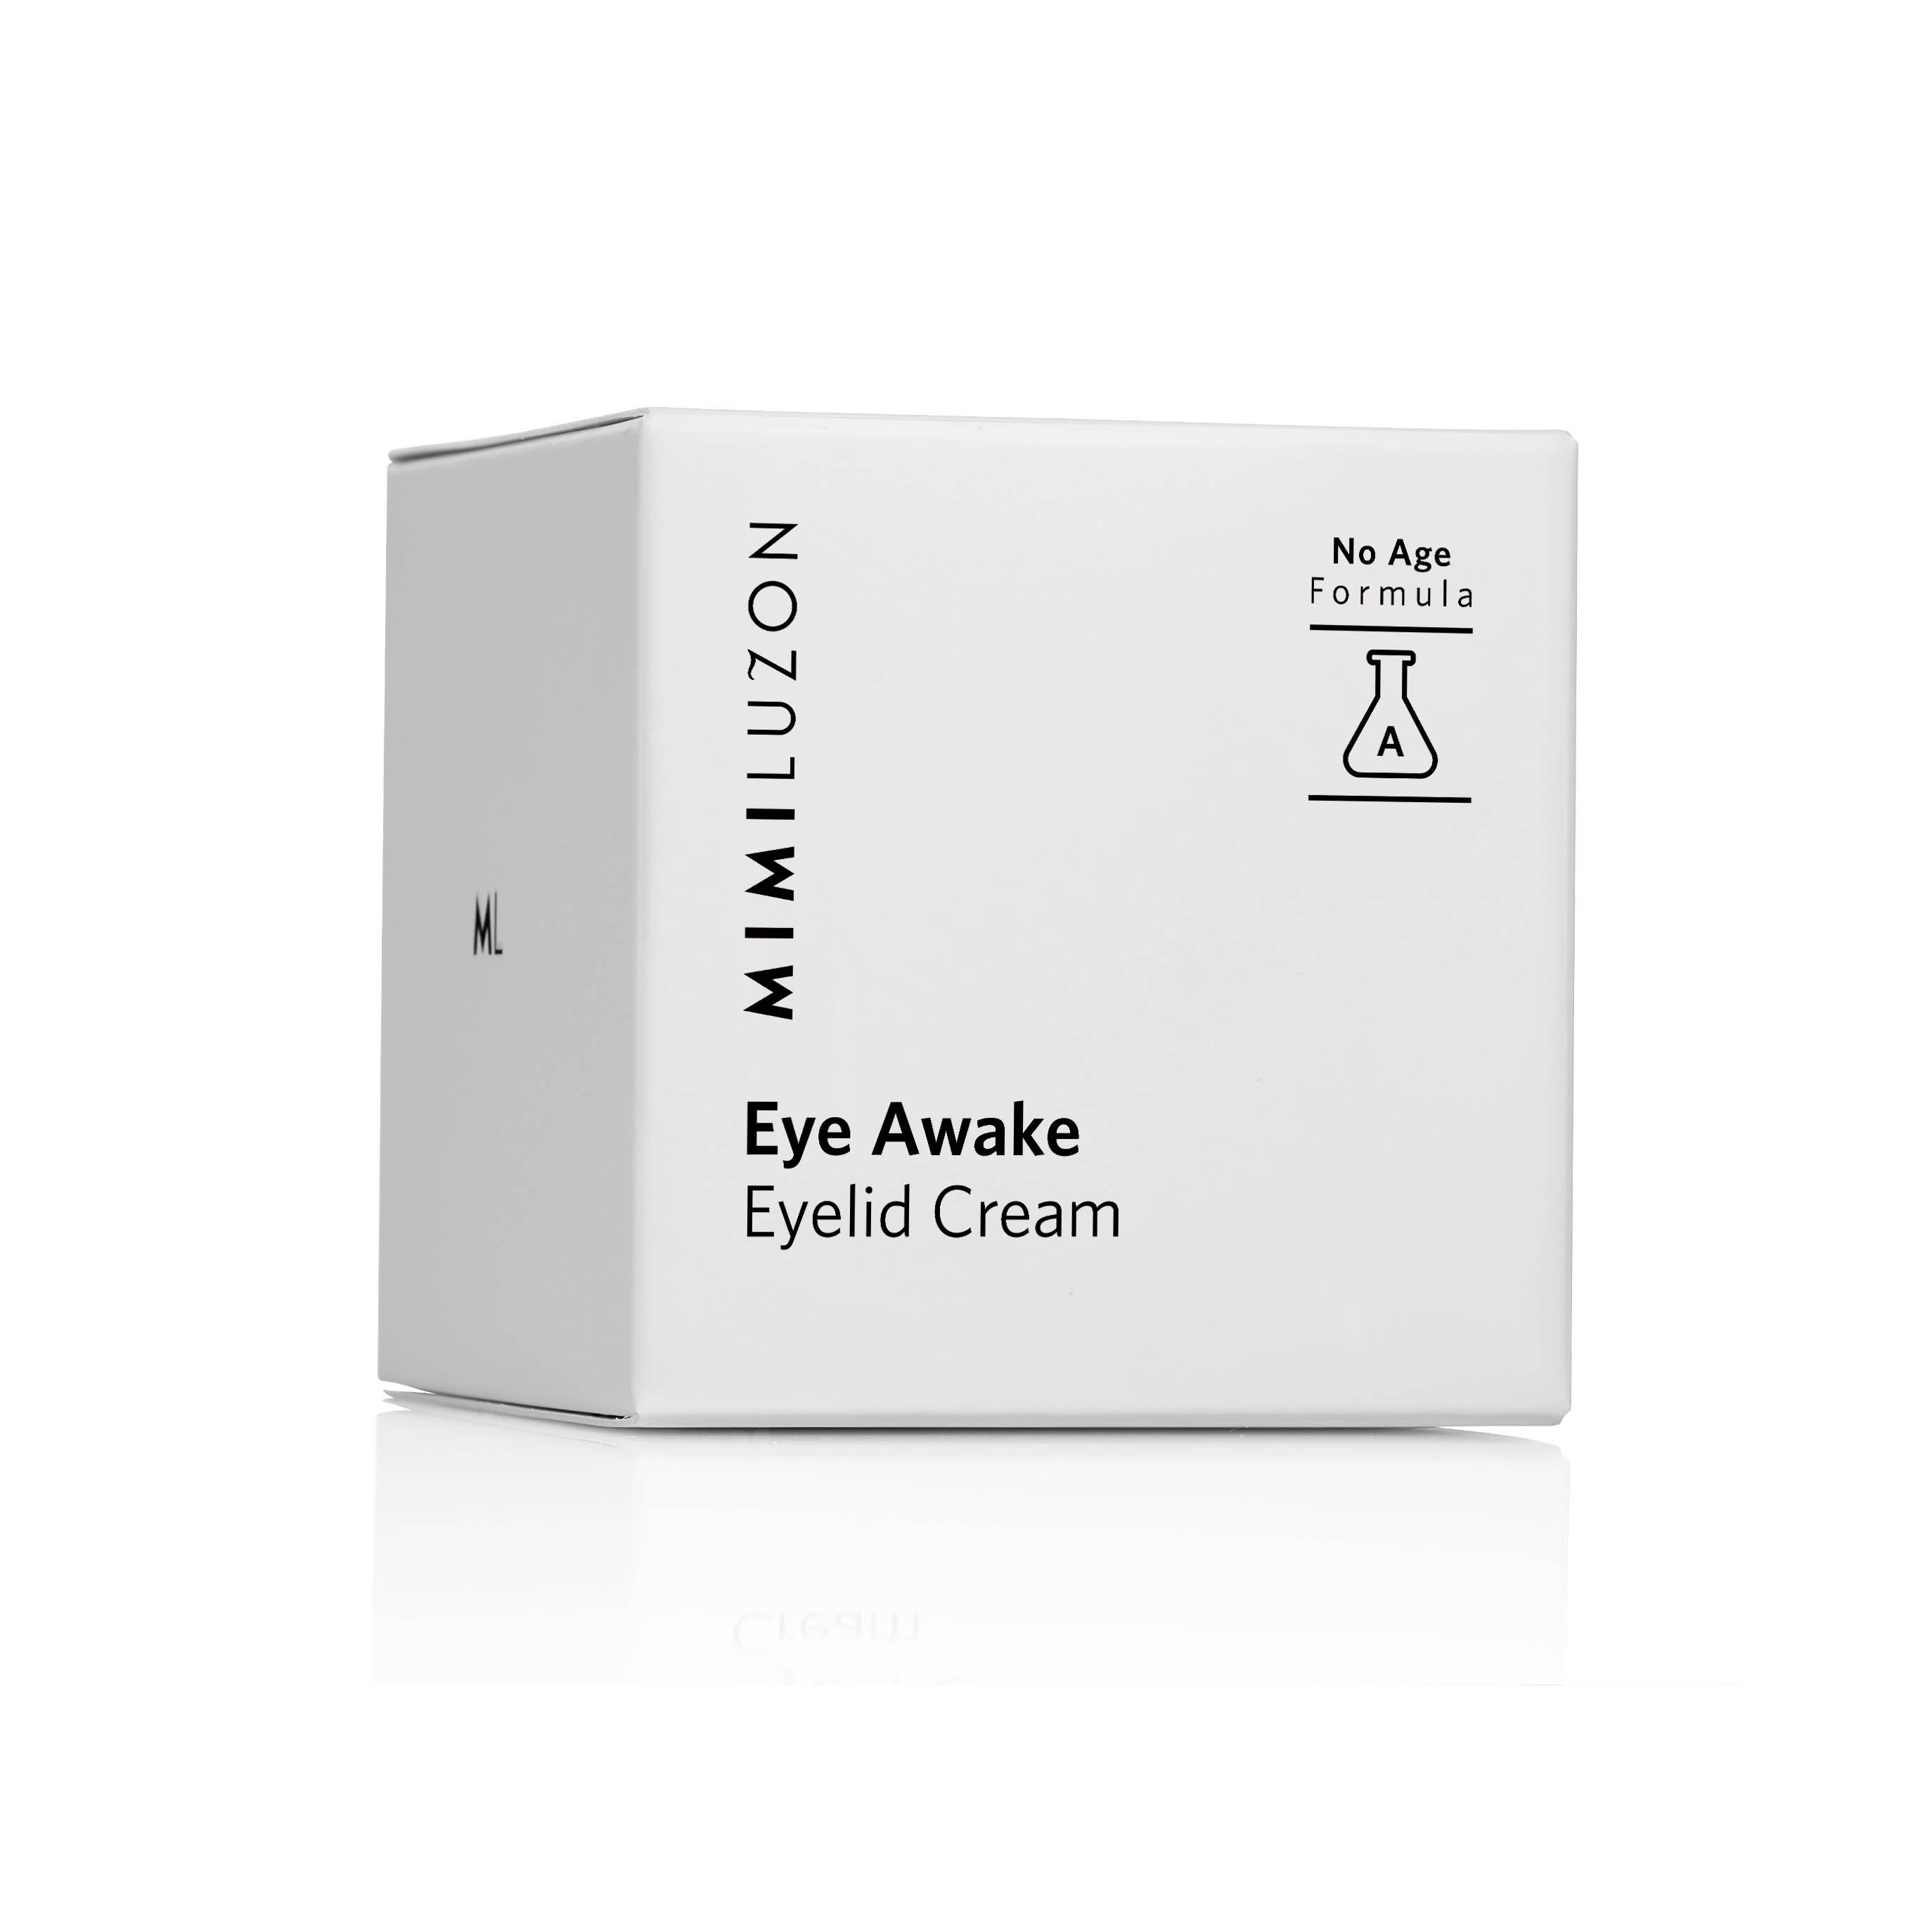 Eye Awake - Eyelid Cream